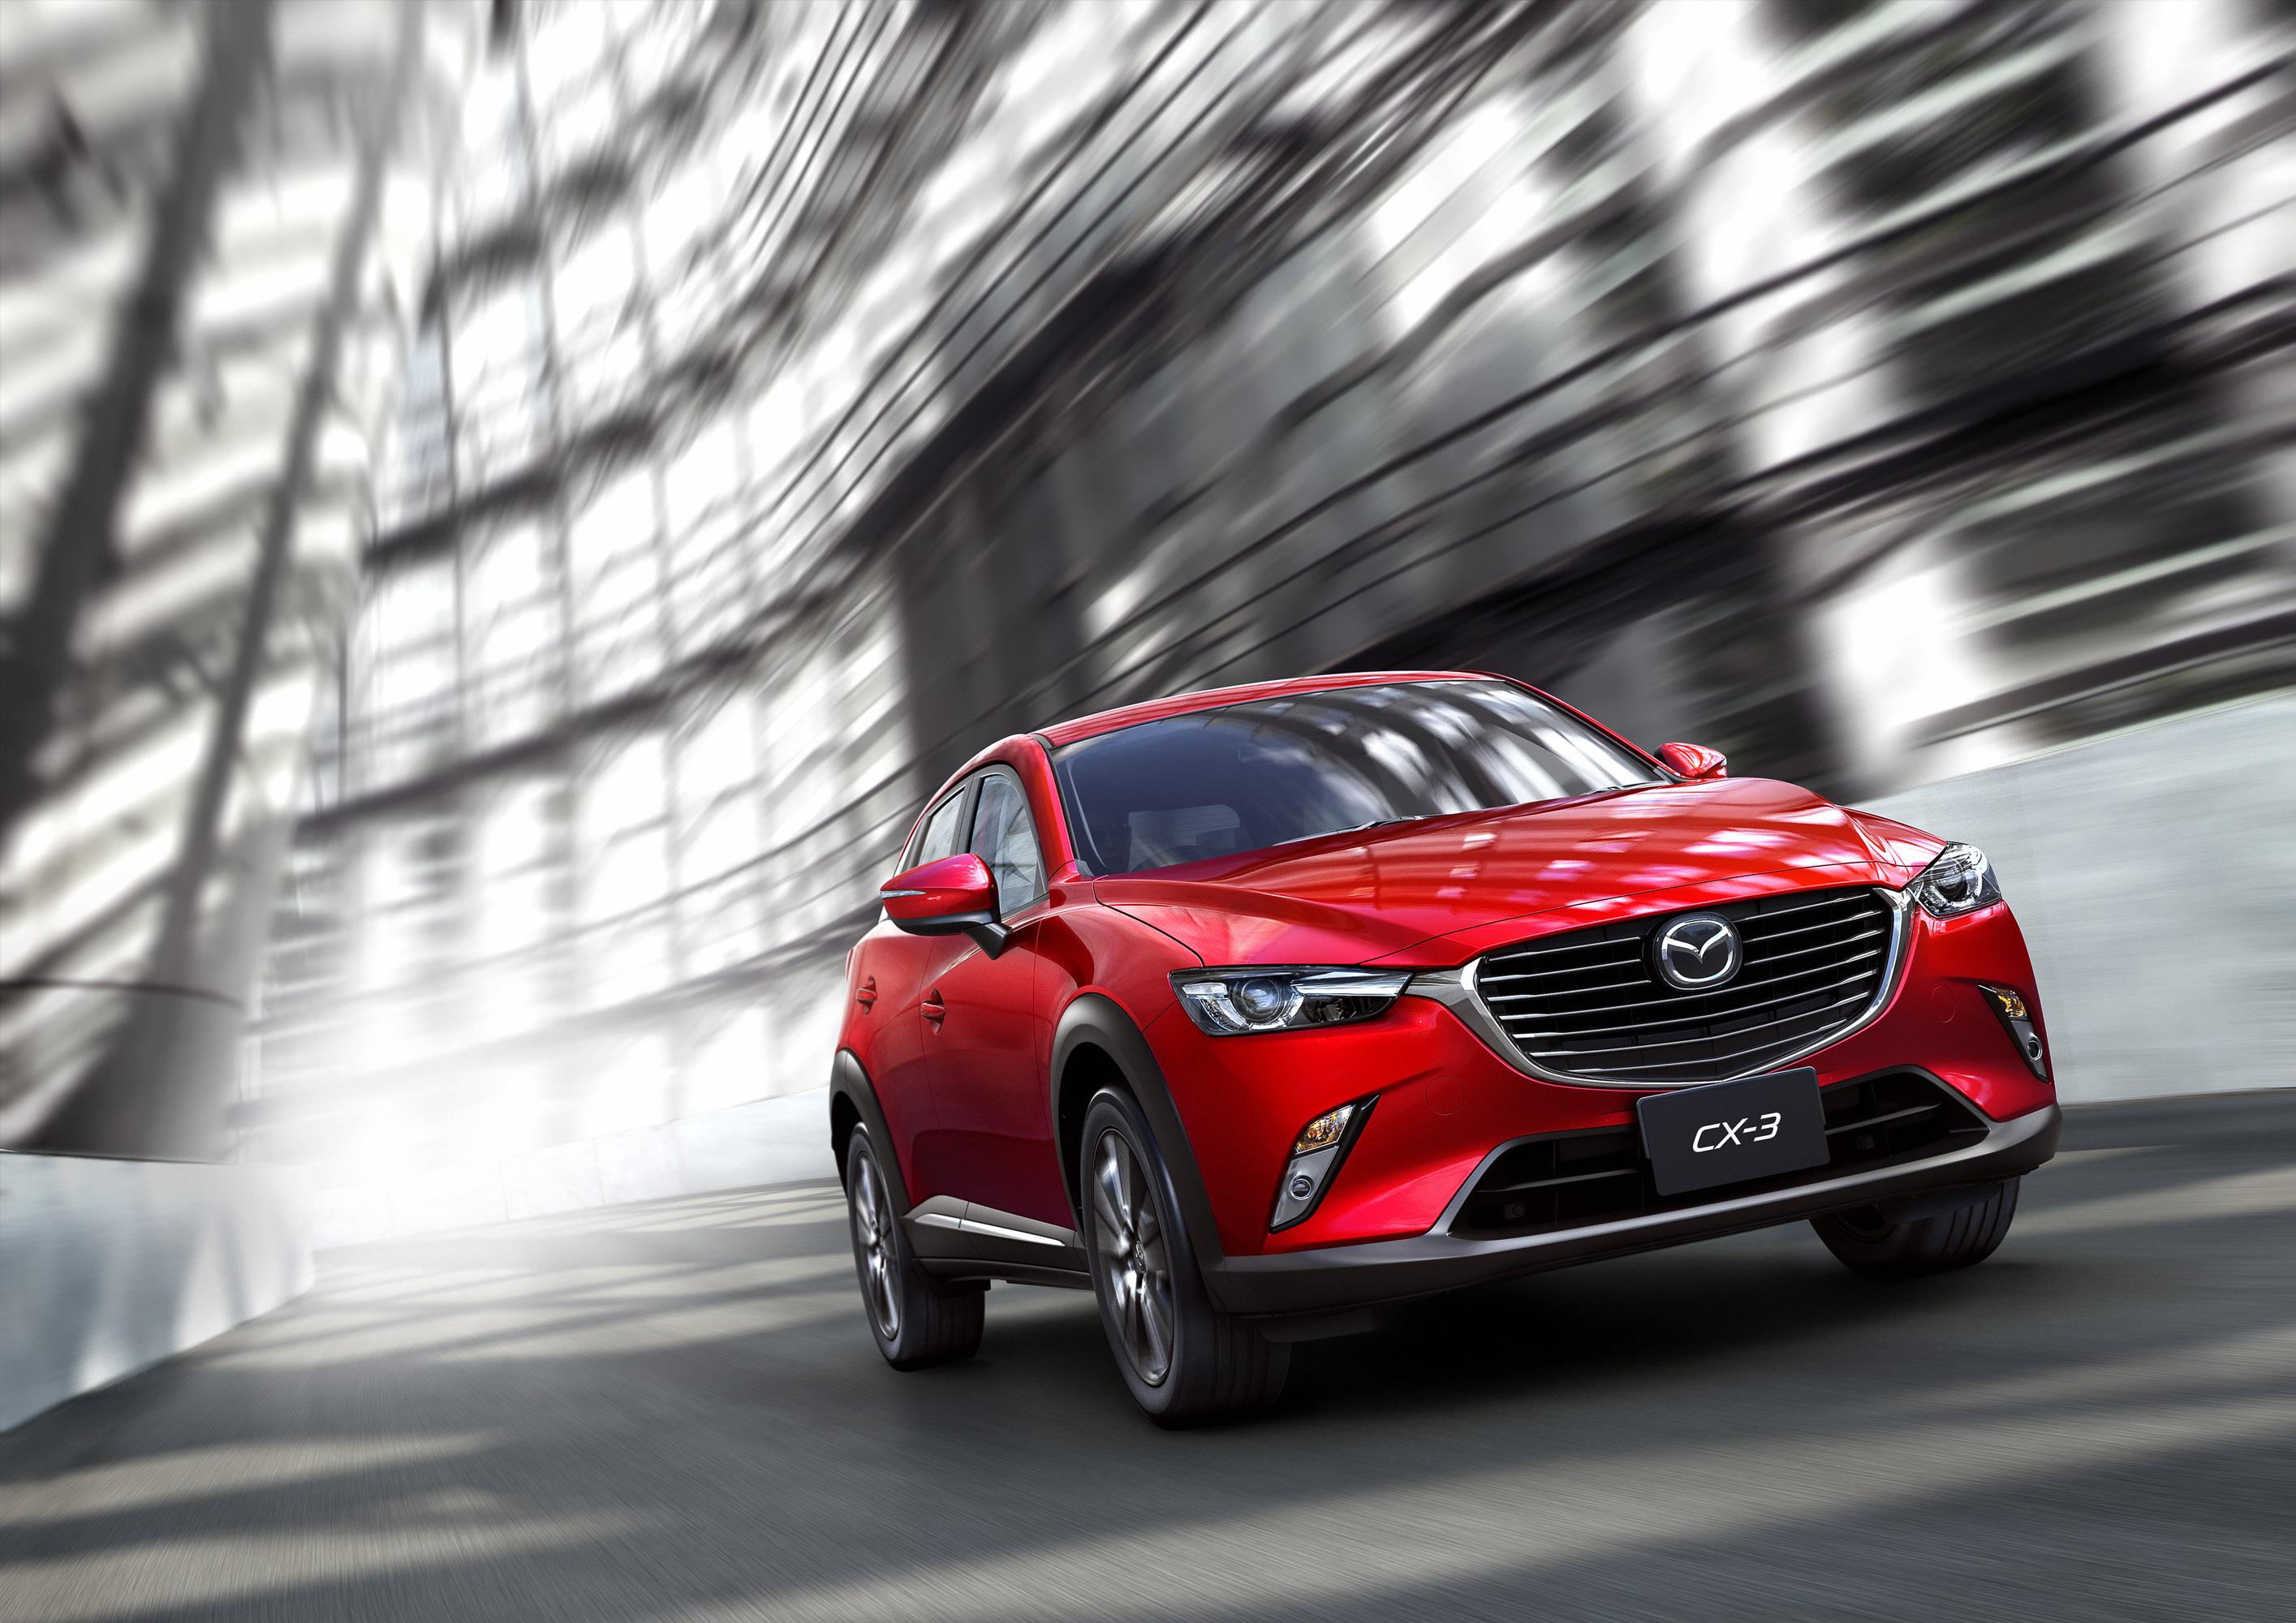 Mazda CX-3 photo #2